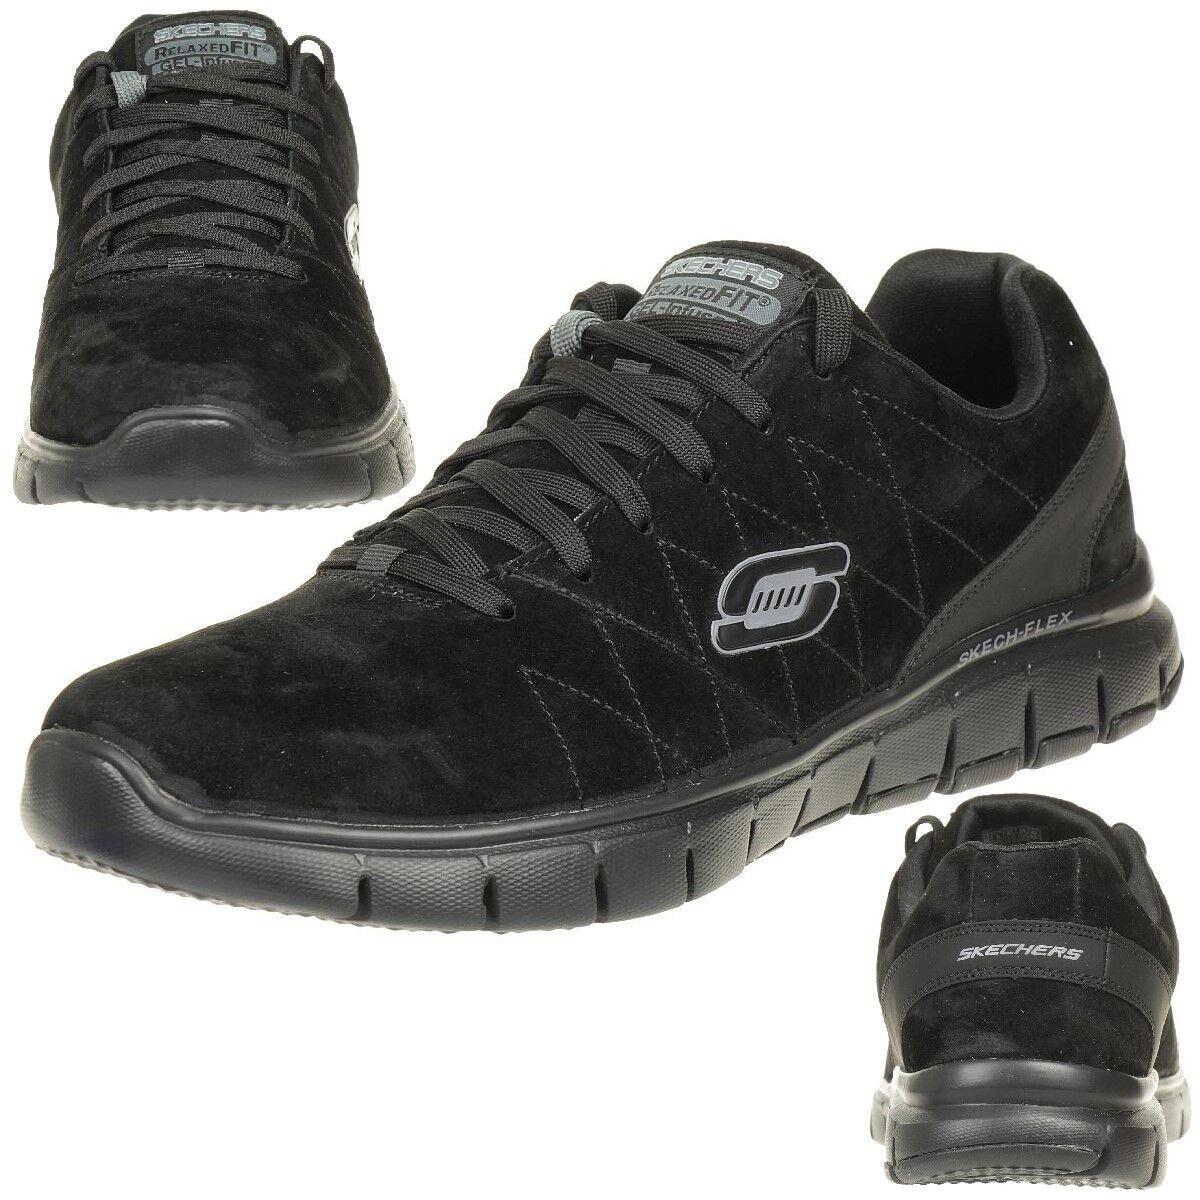 Skechers Skech Flex Natural Vigor Herren Sneaker Schuhe Relaxed Fit BBK